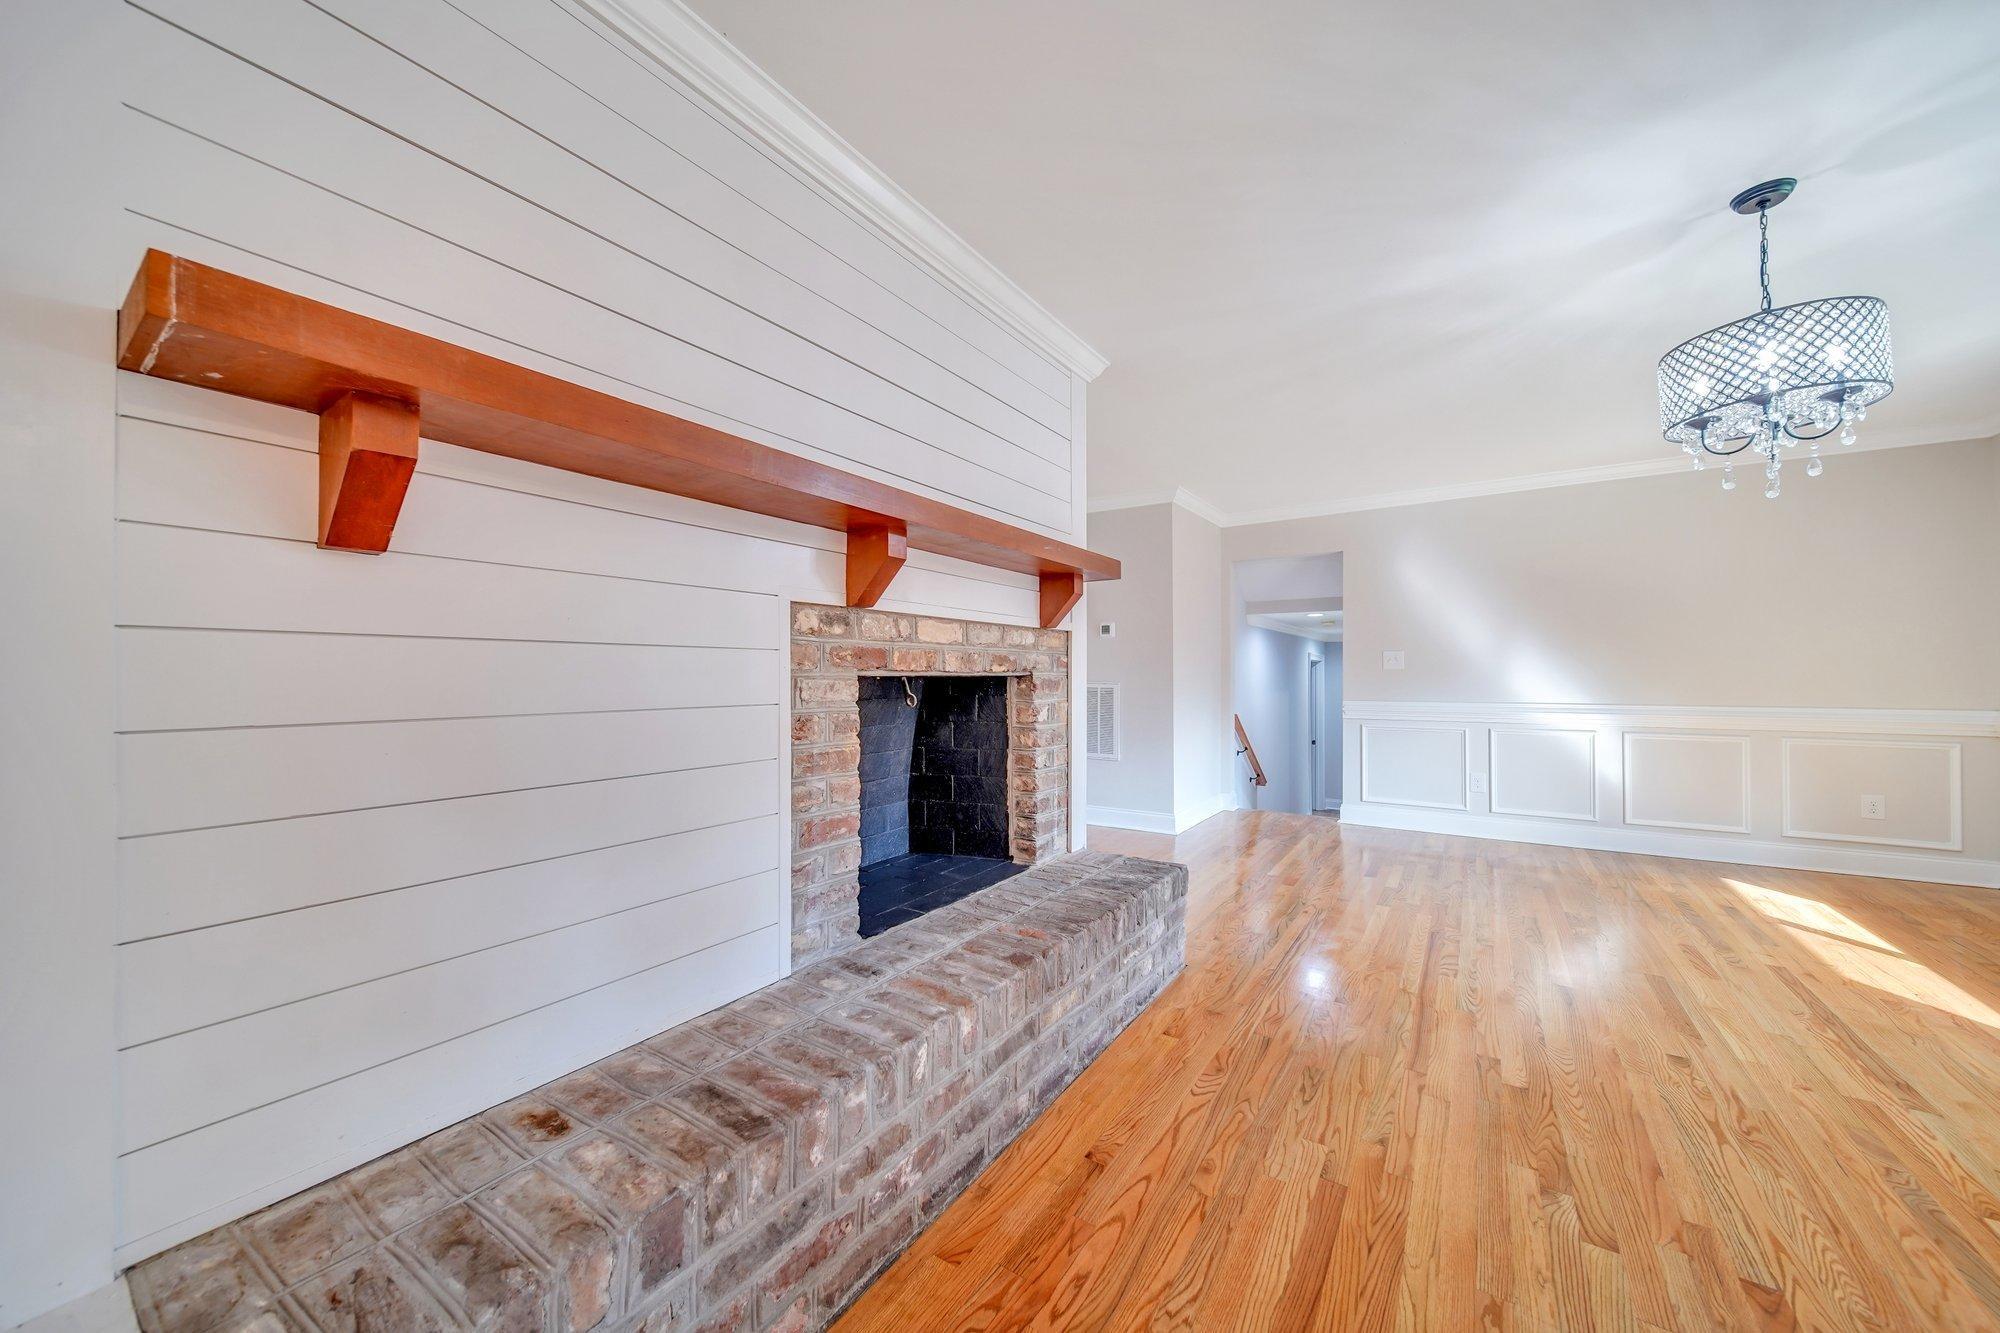 Country Club II Homes For Sale - 1477 Burningtree, Charleston, SC - 5